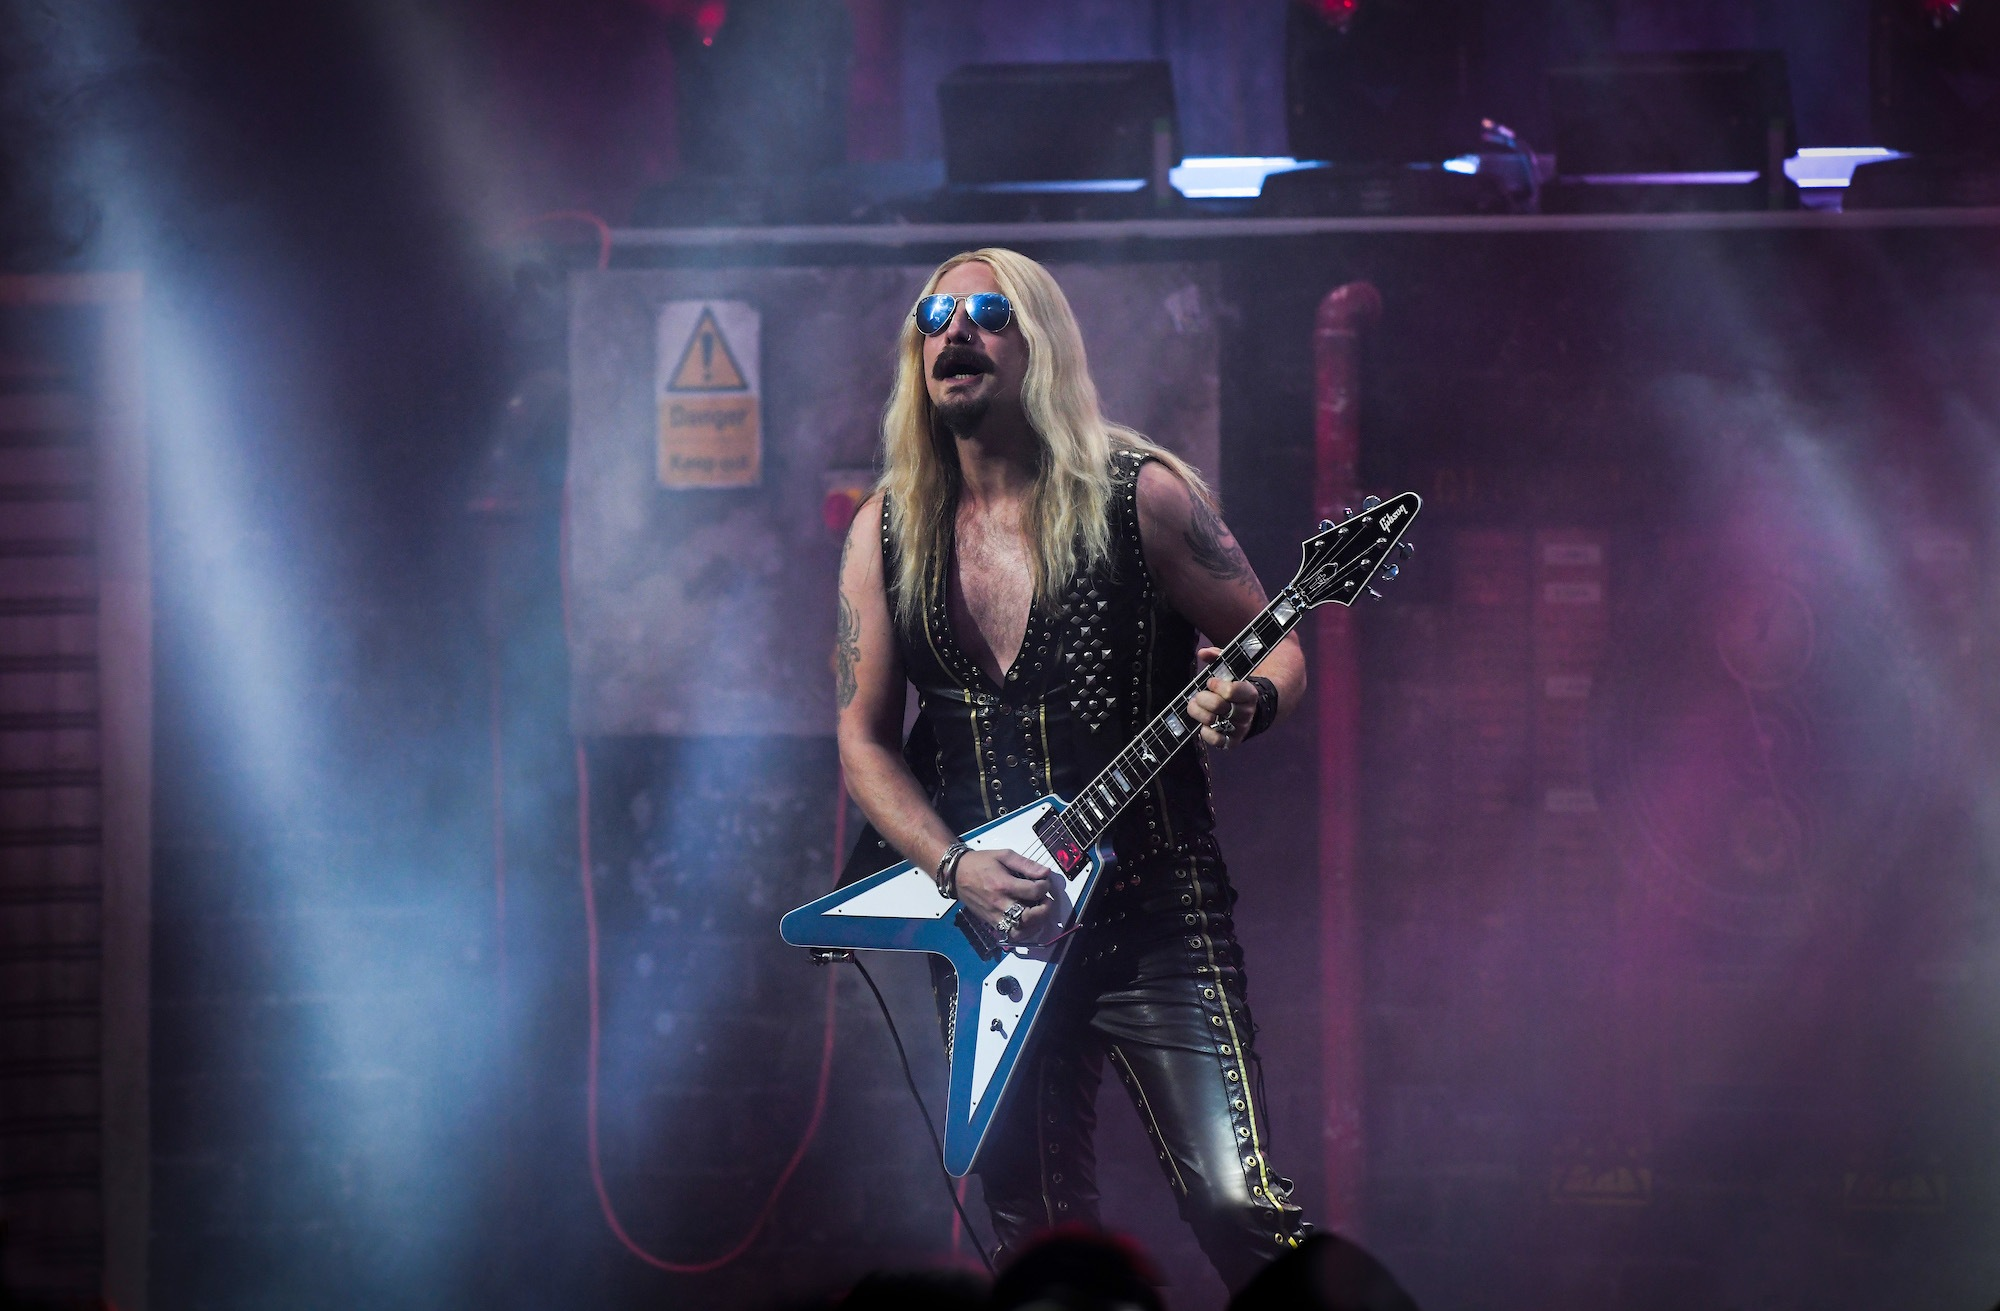 Judas Priest Live at Rosemont Theatre [GALLERY] 18